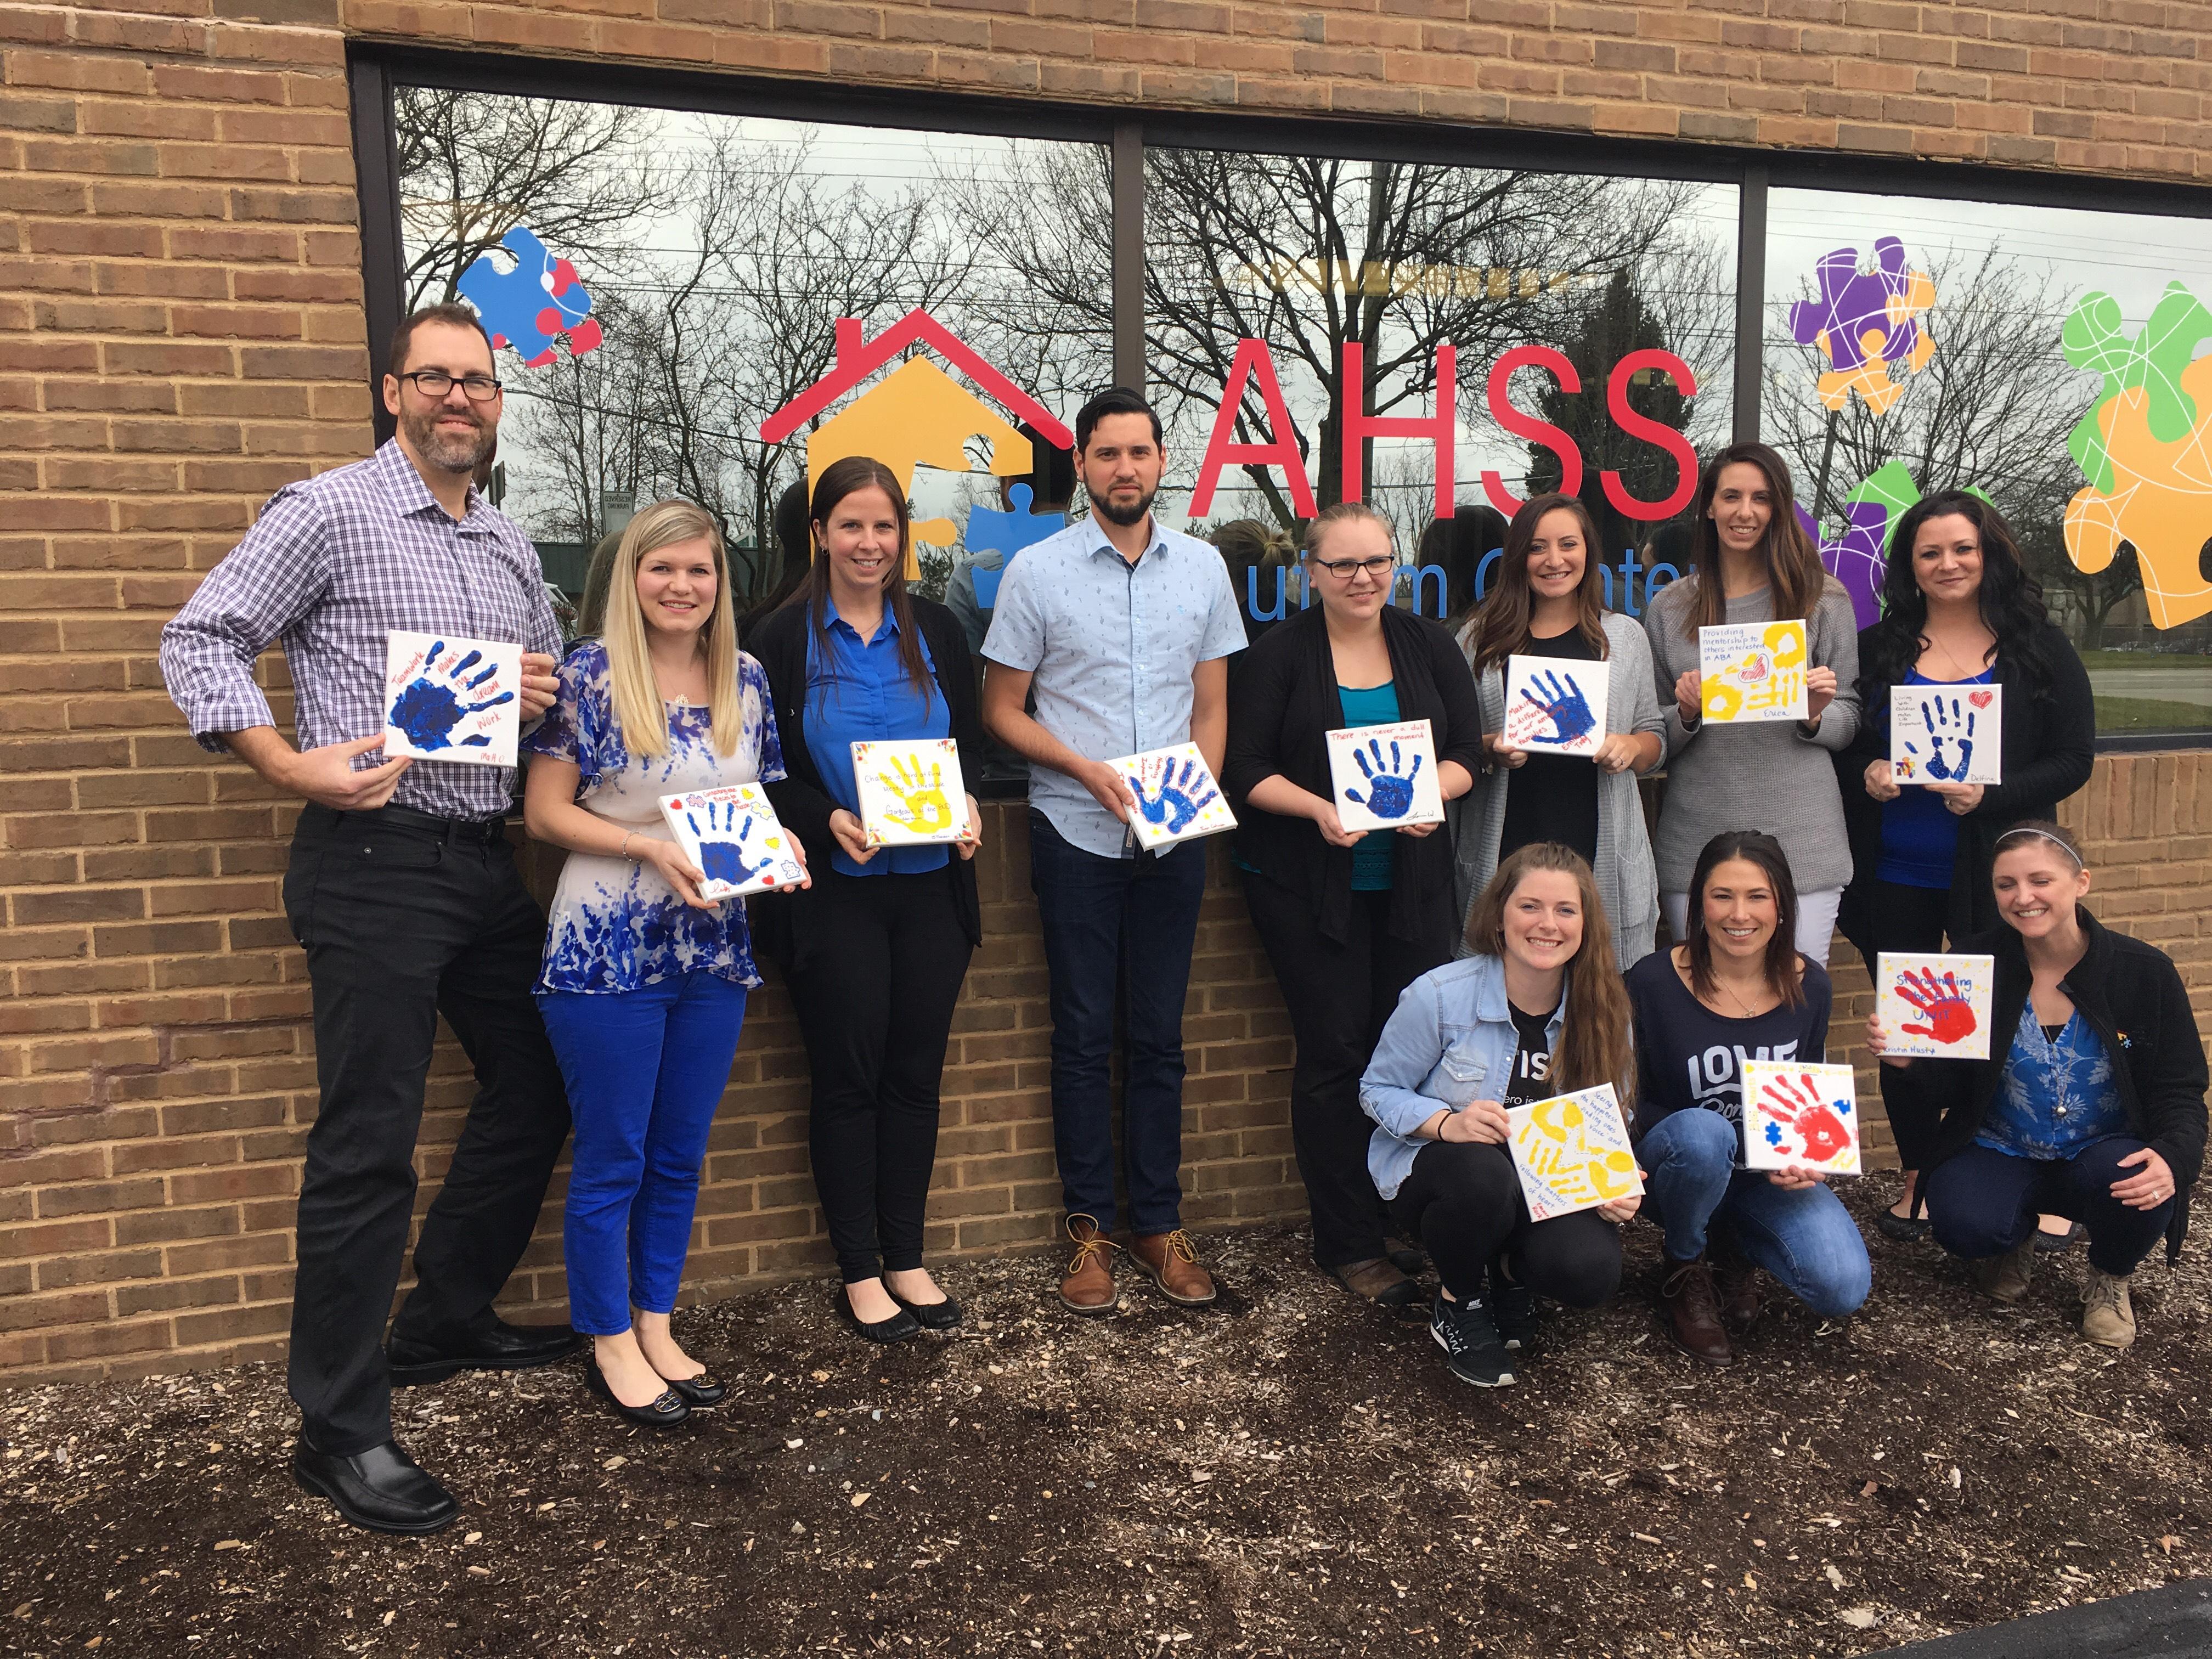 AHSS Autism Center - Northville crew